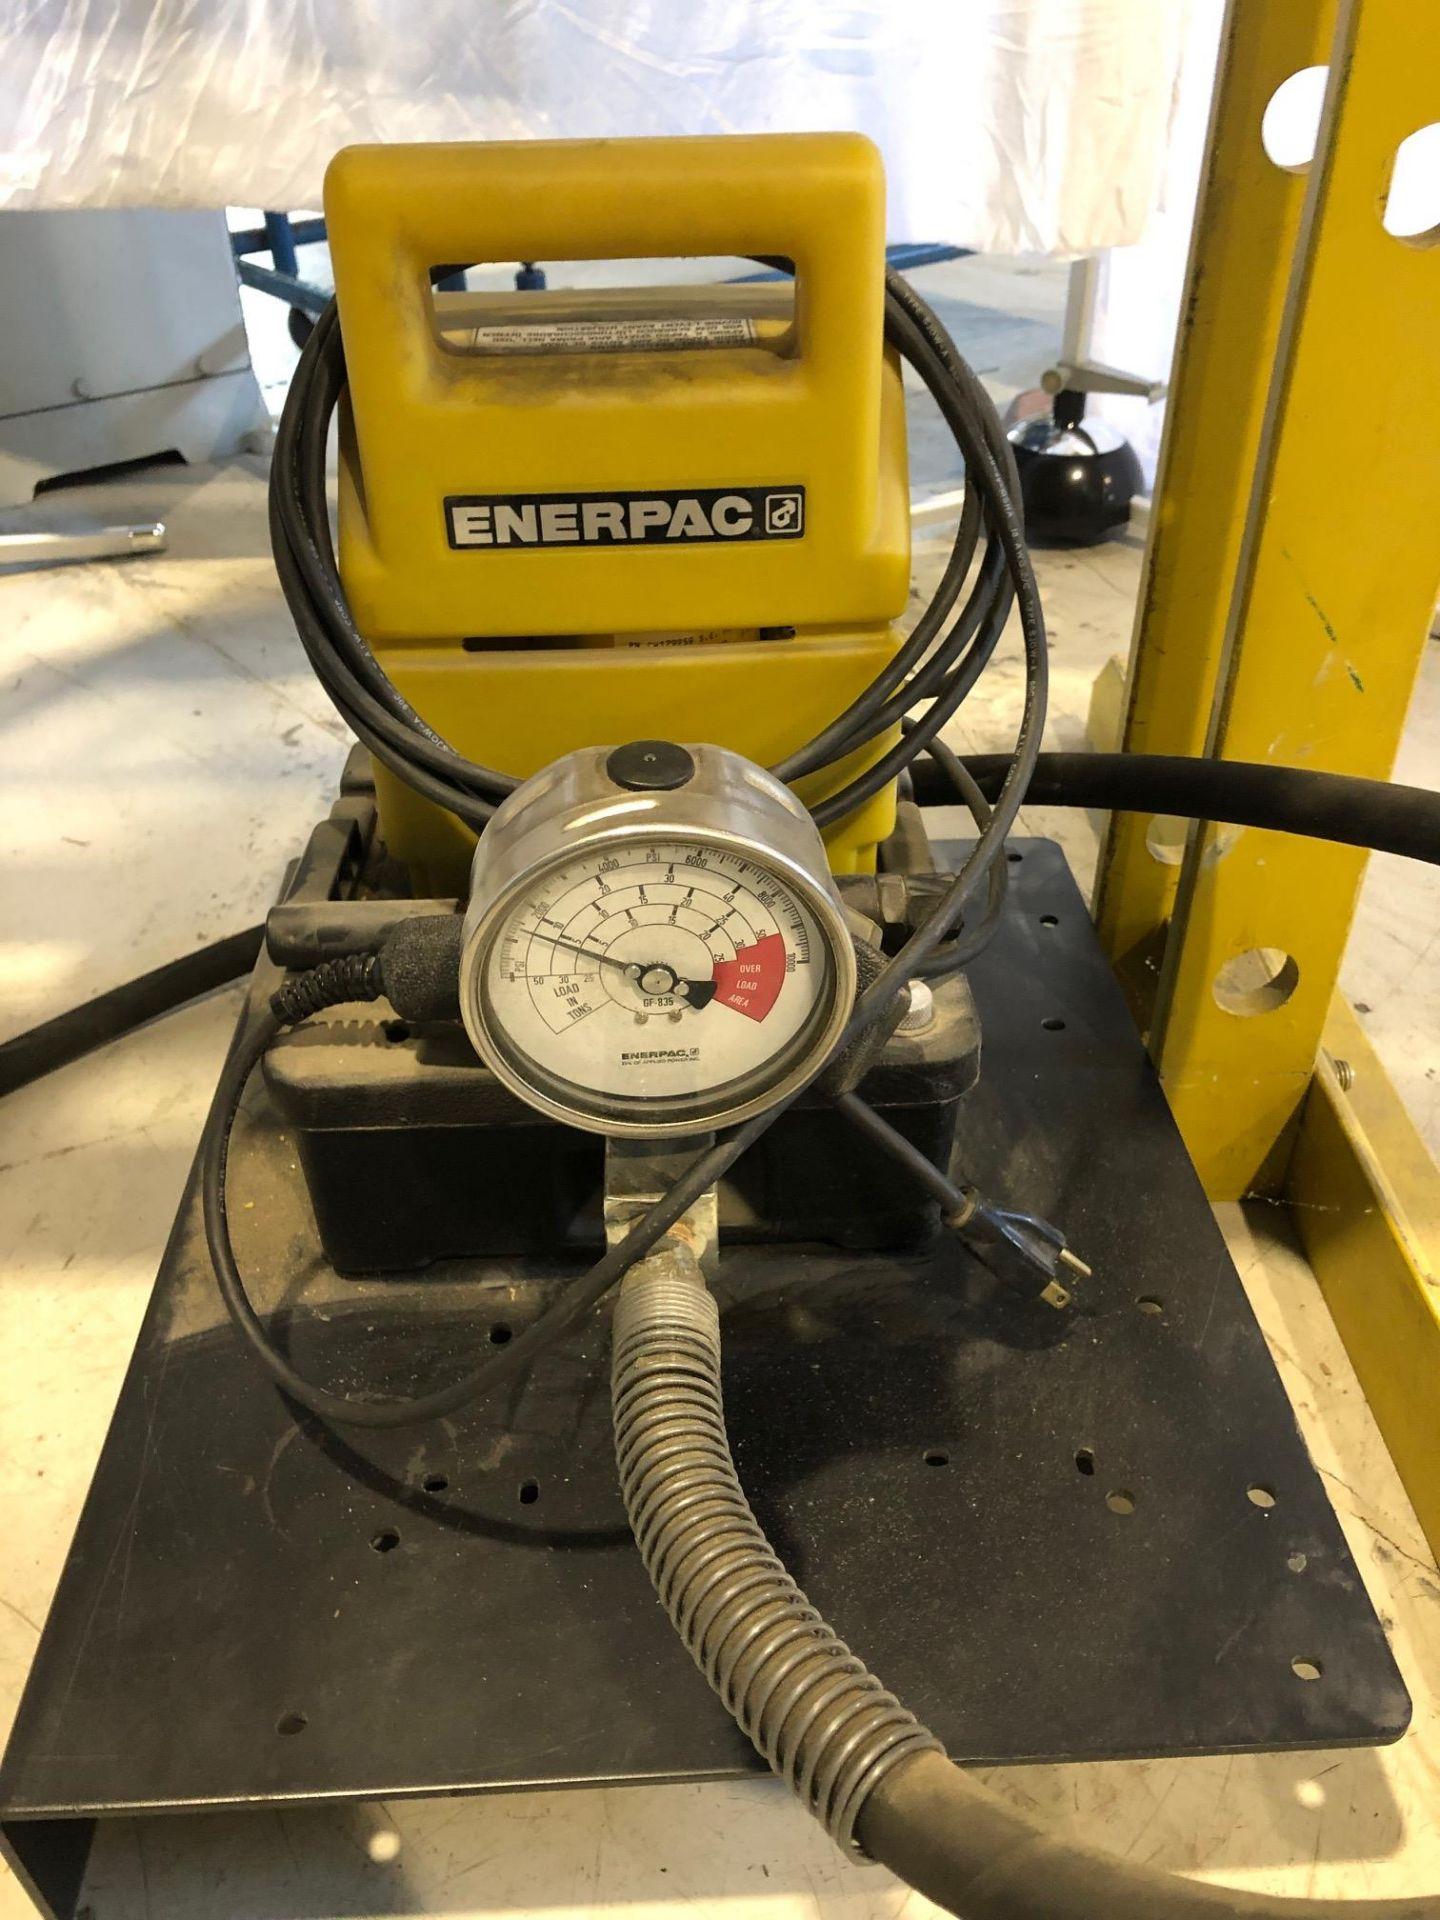 ENERPAC SHOP PRESS, MODEL C215900, S/N E119C, 15 TON - LOCATION, MONTREAL, QUEBEC - Image 3 of 5